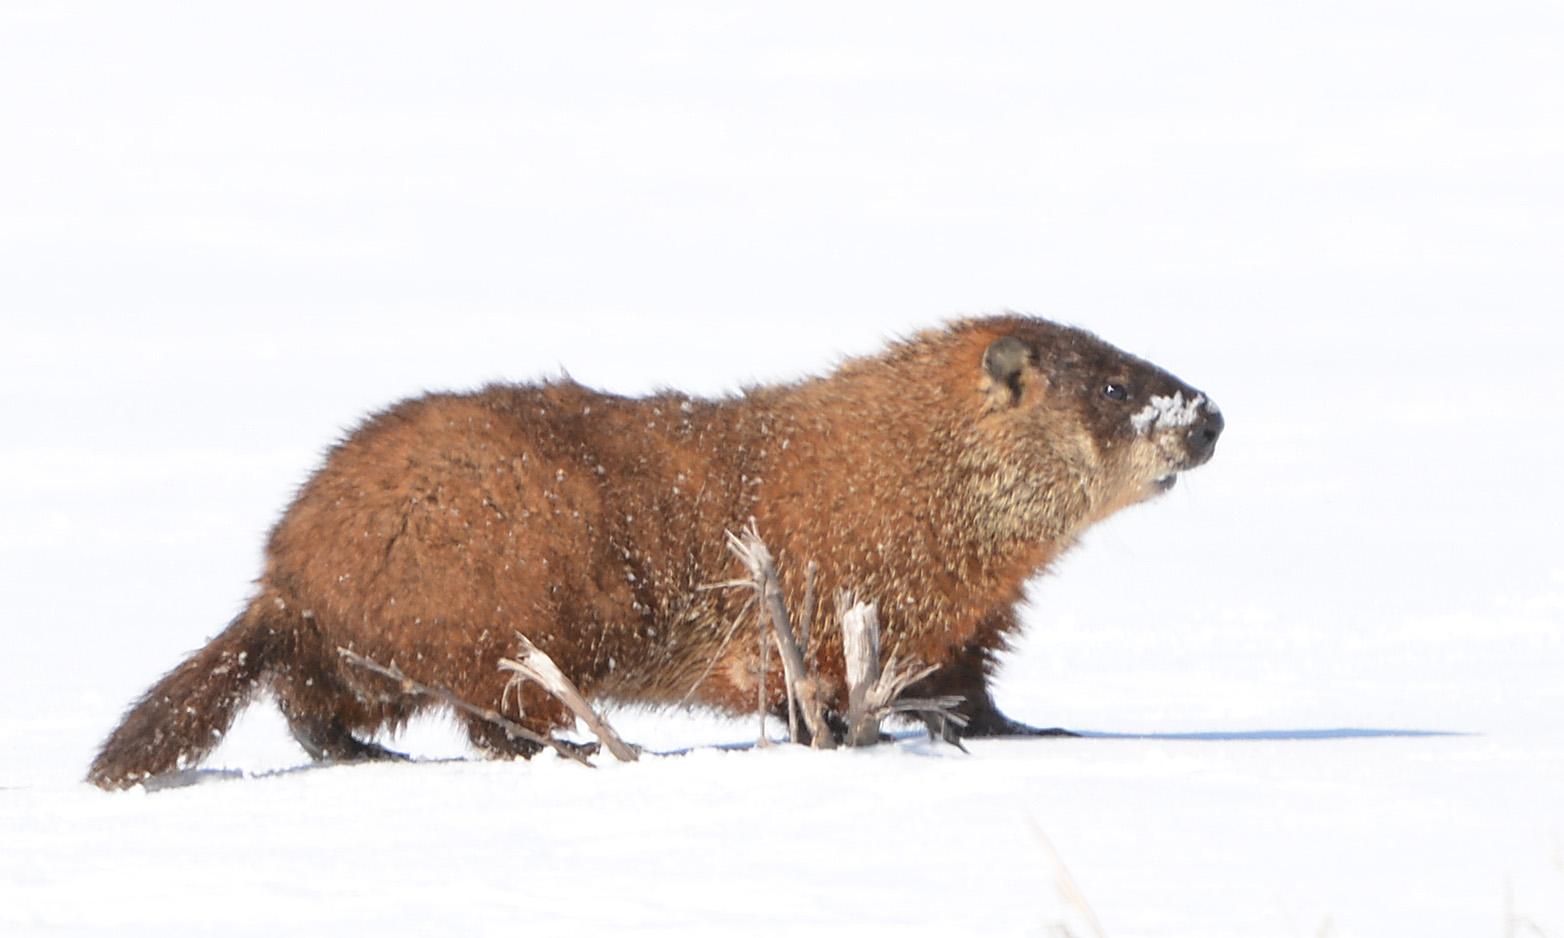 Groundhogs In Snow Nicks Nature Pics